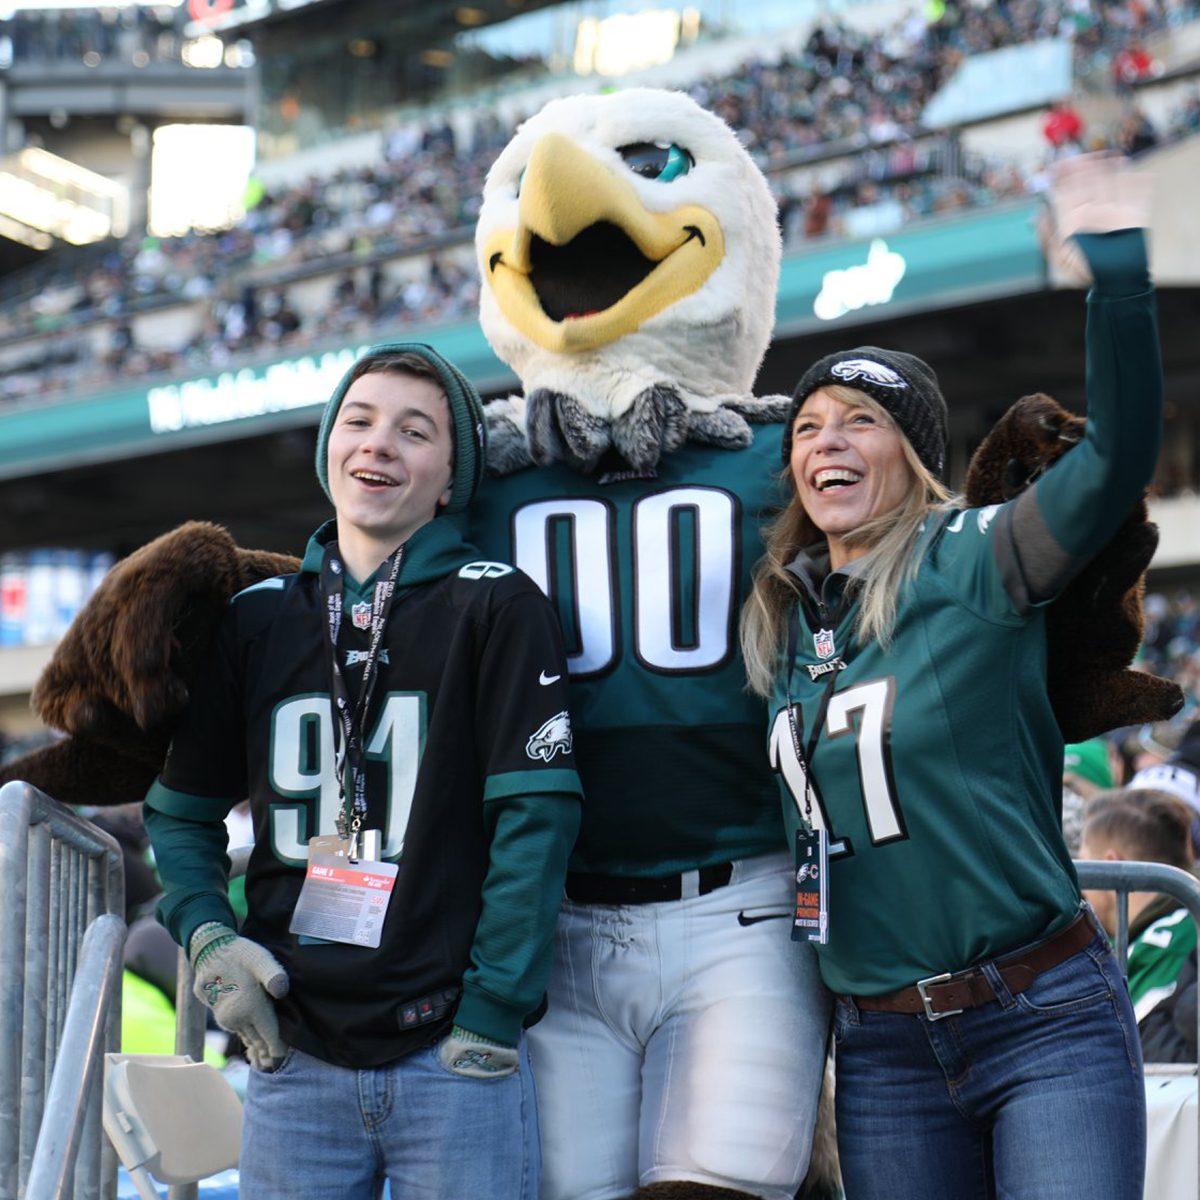 Philadelphia Eagles fans posing with mascot